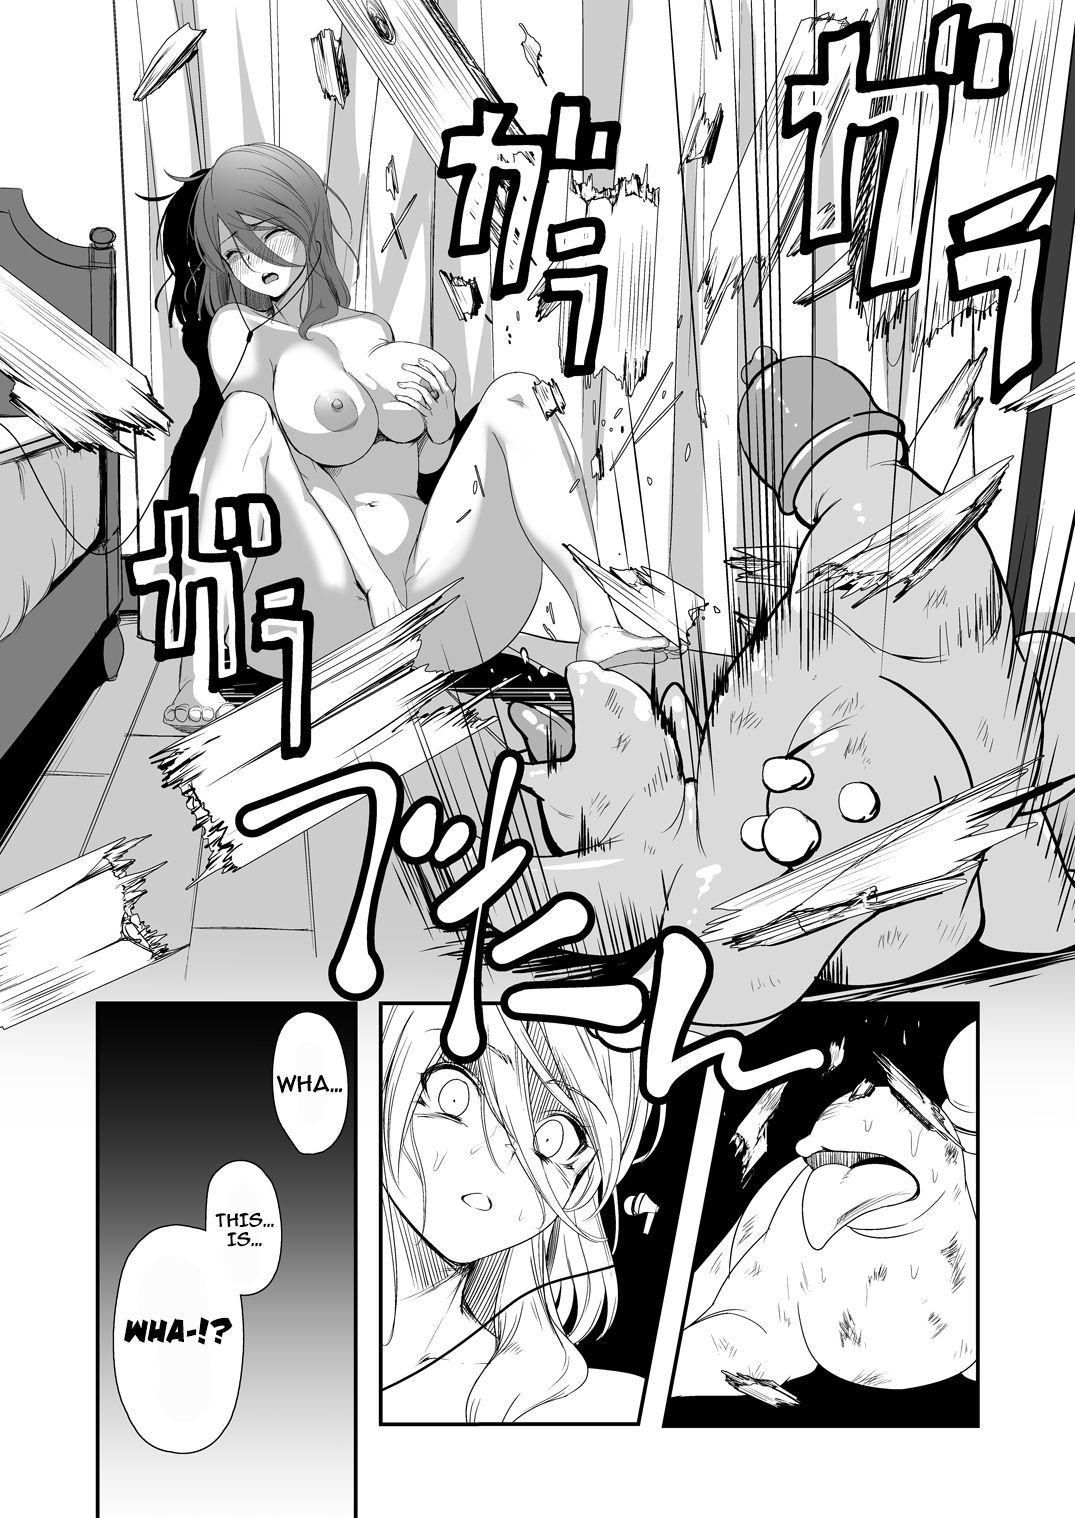 Igyo no Kimi to | A Tentacled Romance Ch. 1-2 page 4